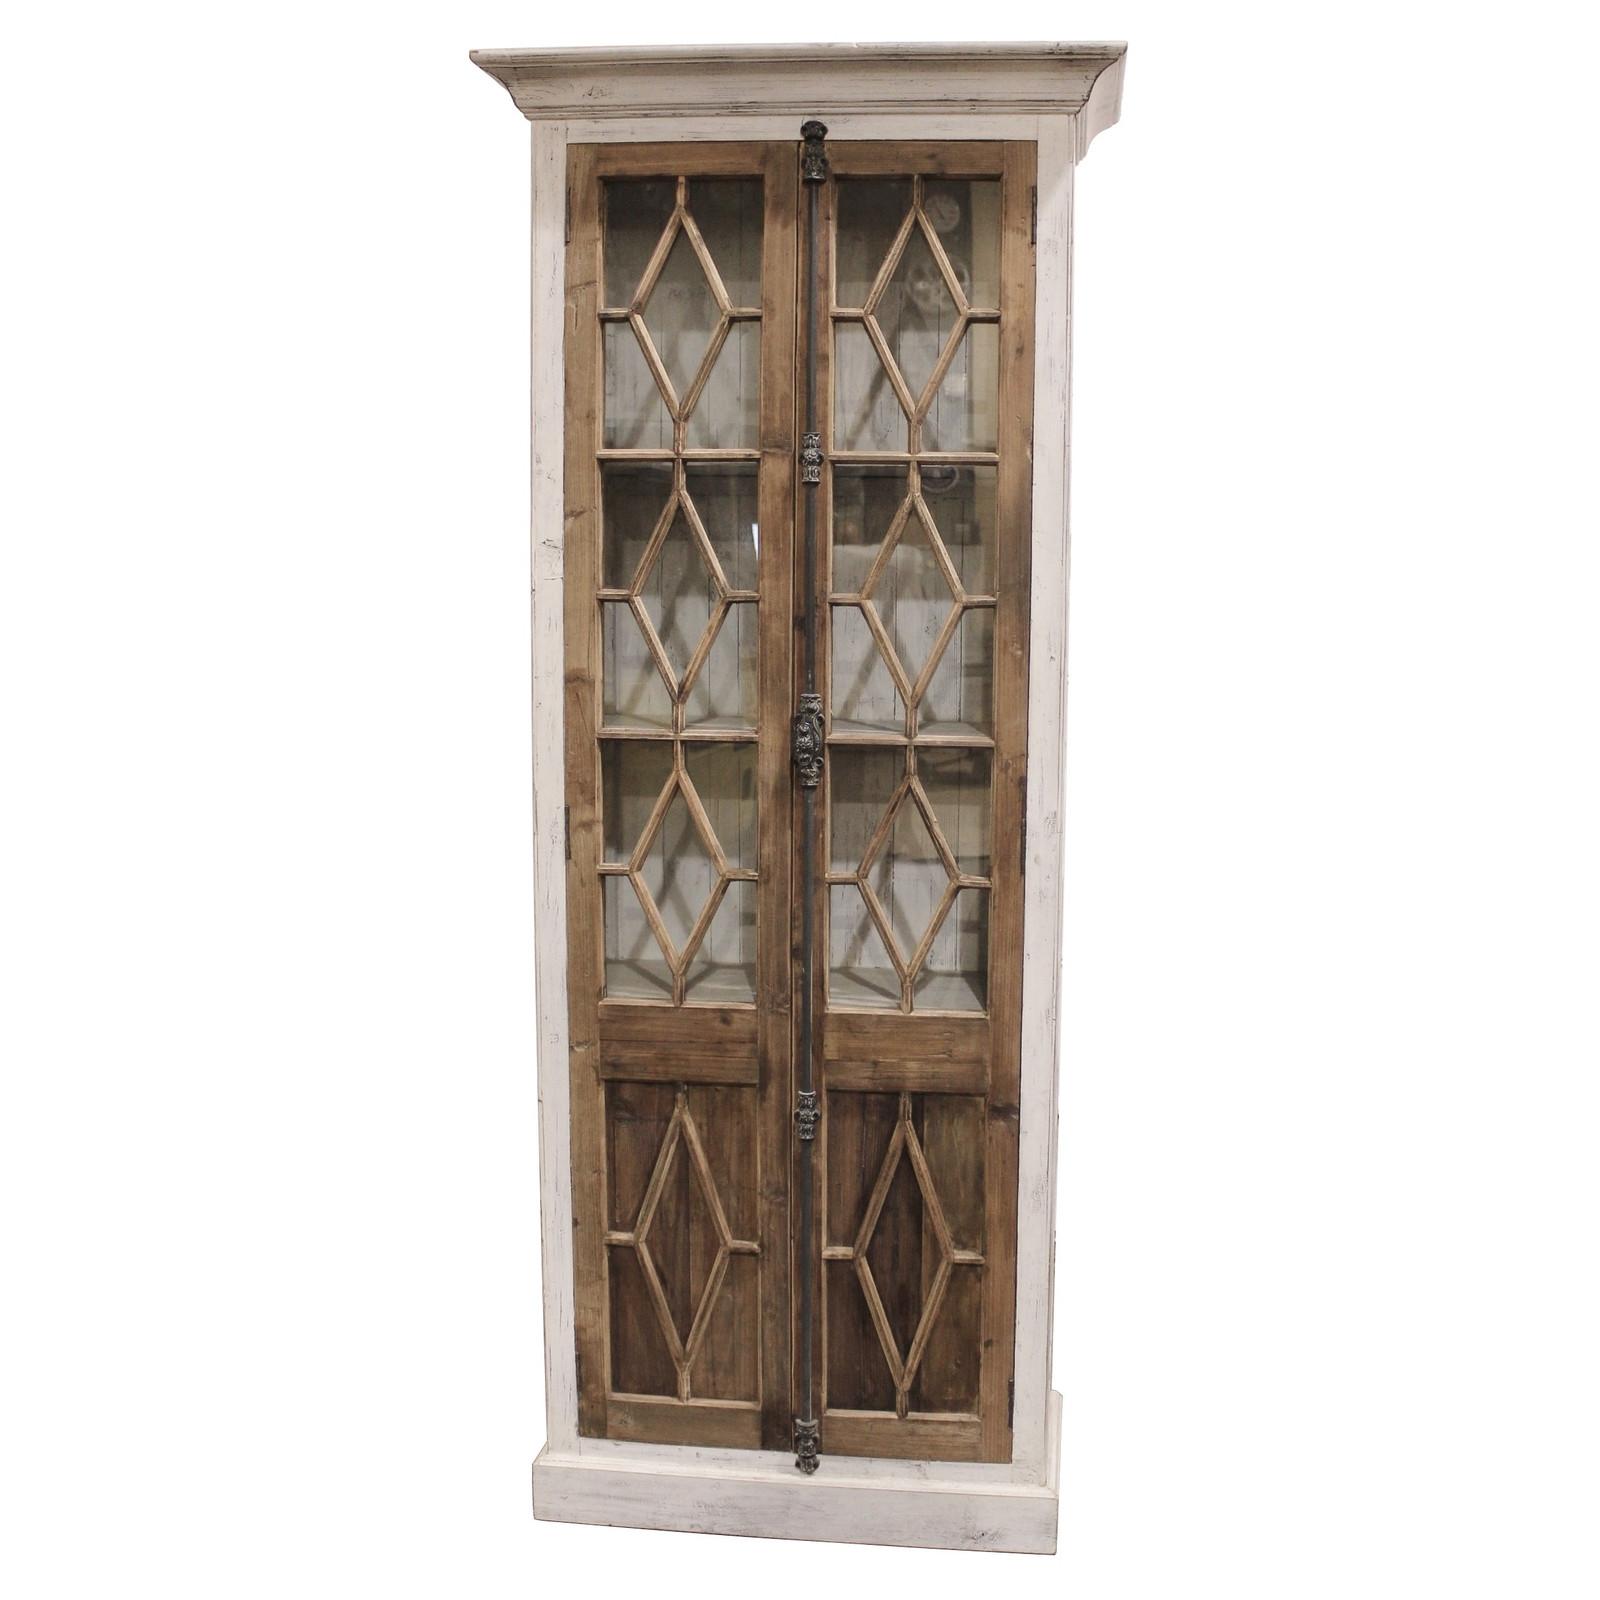 Restoration hardware horchow french casement glass fretwork armoire bookshelf cabinets cupboards - Restoration hardware cabinets ...